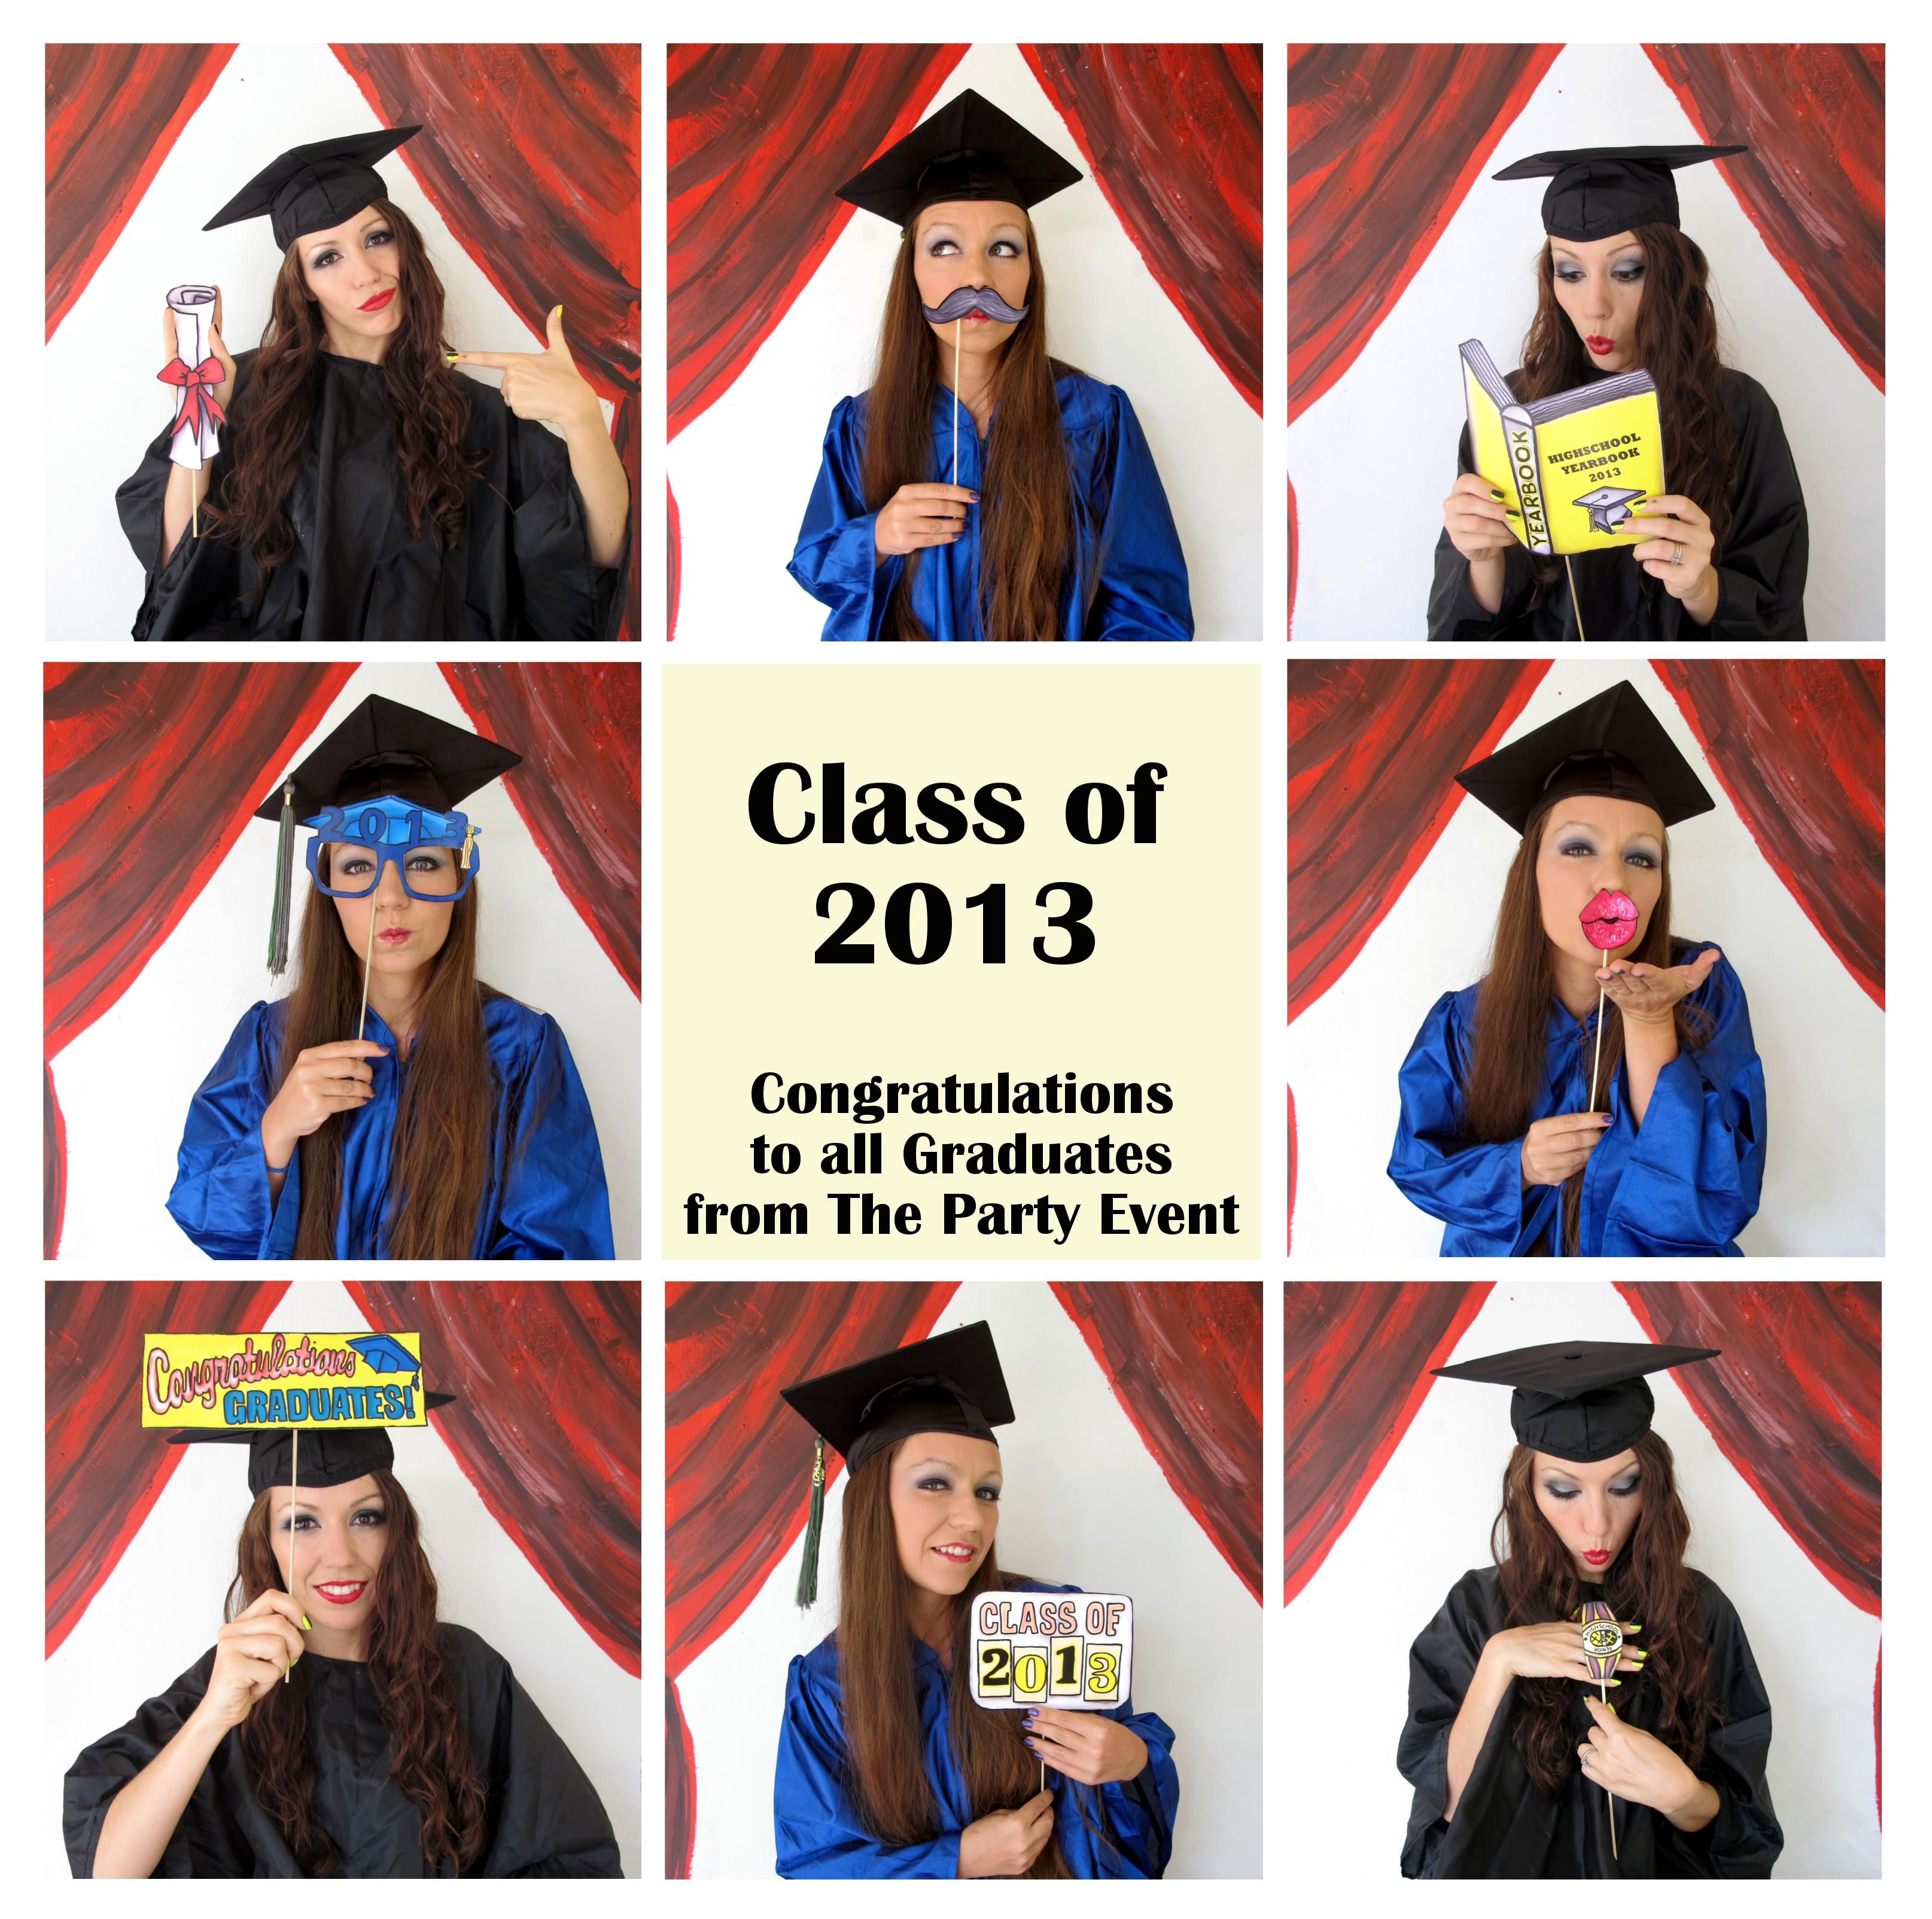 Graduationcollage4 Graduationcollage3 Graduationcollage2 Graduationcollage1